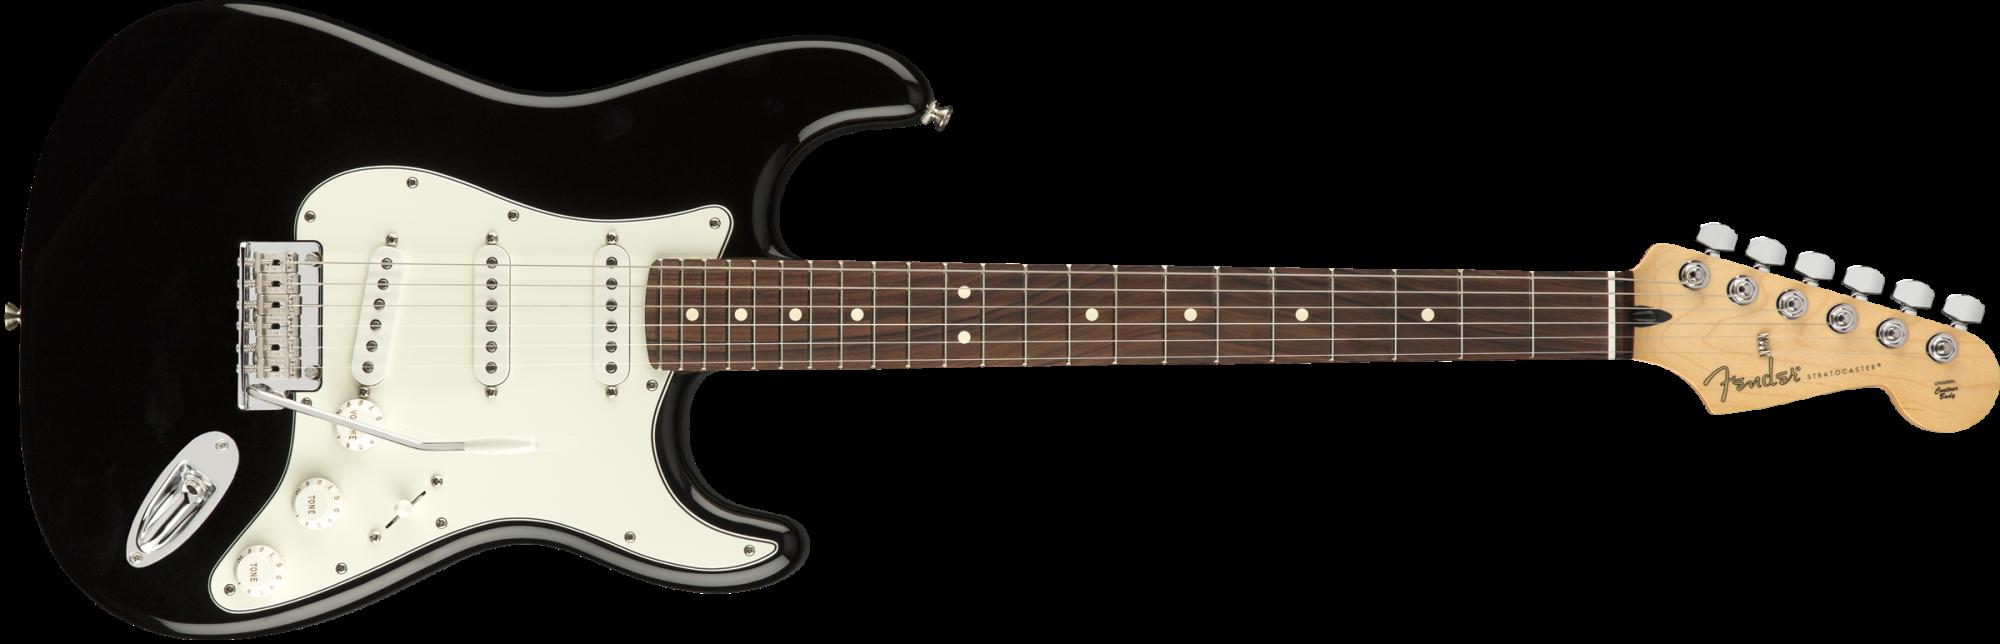 Fender Player Stratocaster Electric Guitar - Pau Ferro Fingerboard - Black